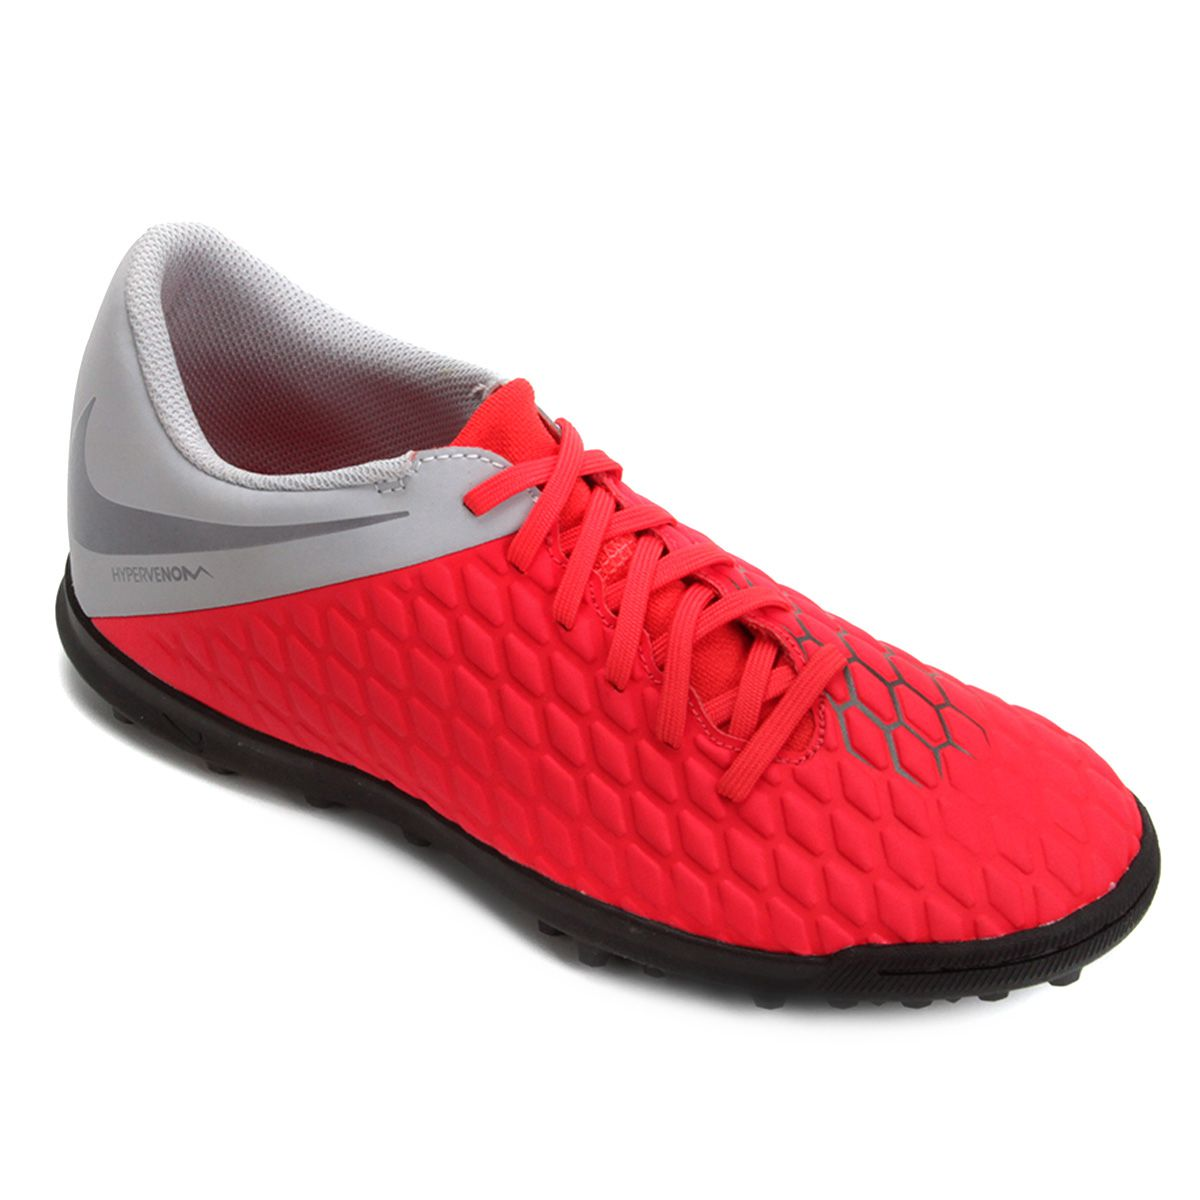 7eb2383ab Chuteira Society Nike Phantomx 3 Club Tf - BRACIA SHOP  Loja de ...